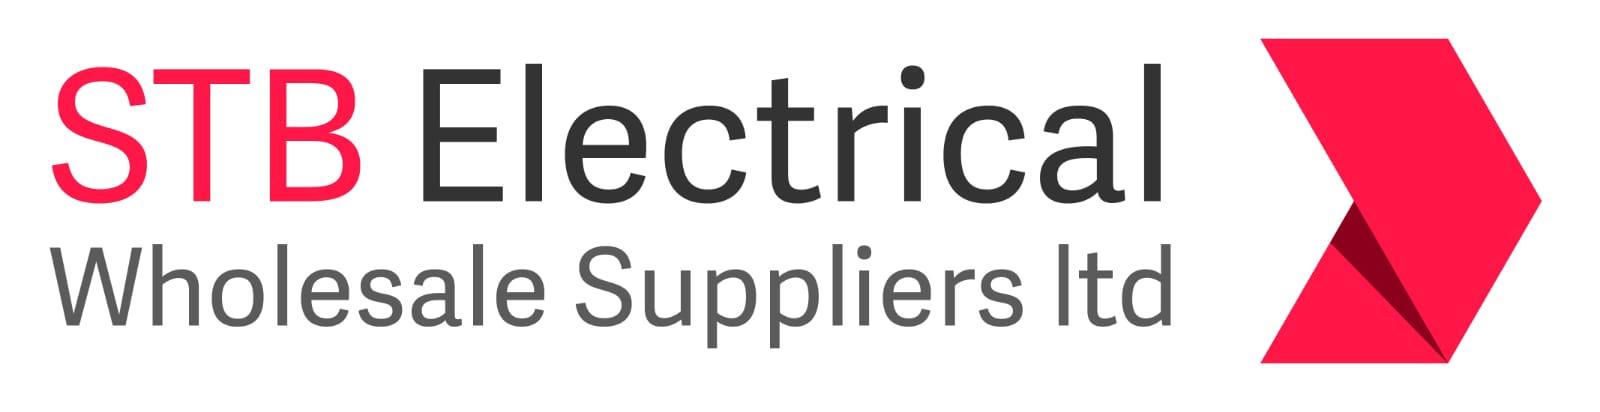 STB Electrical Wholesale Ltd